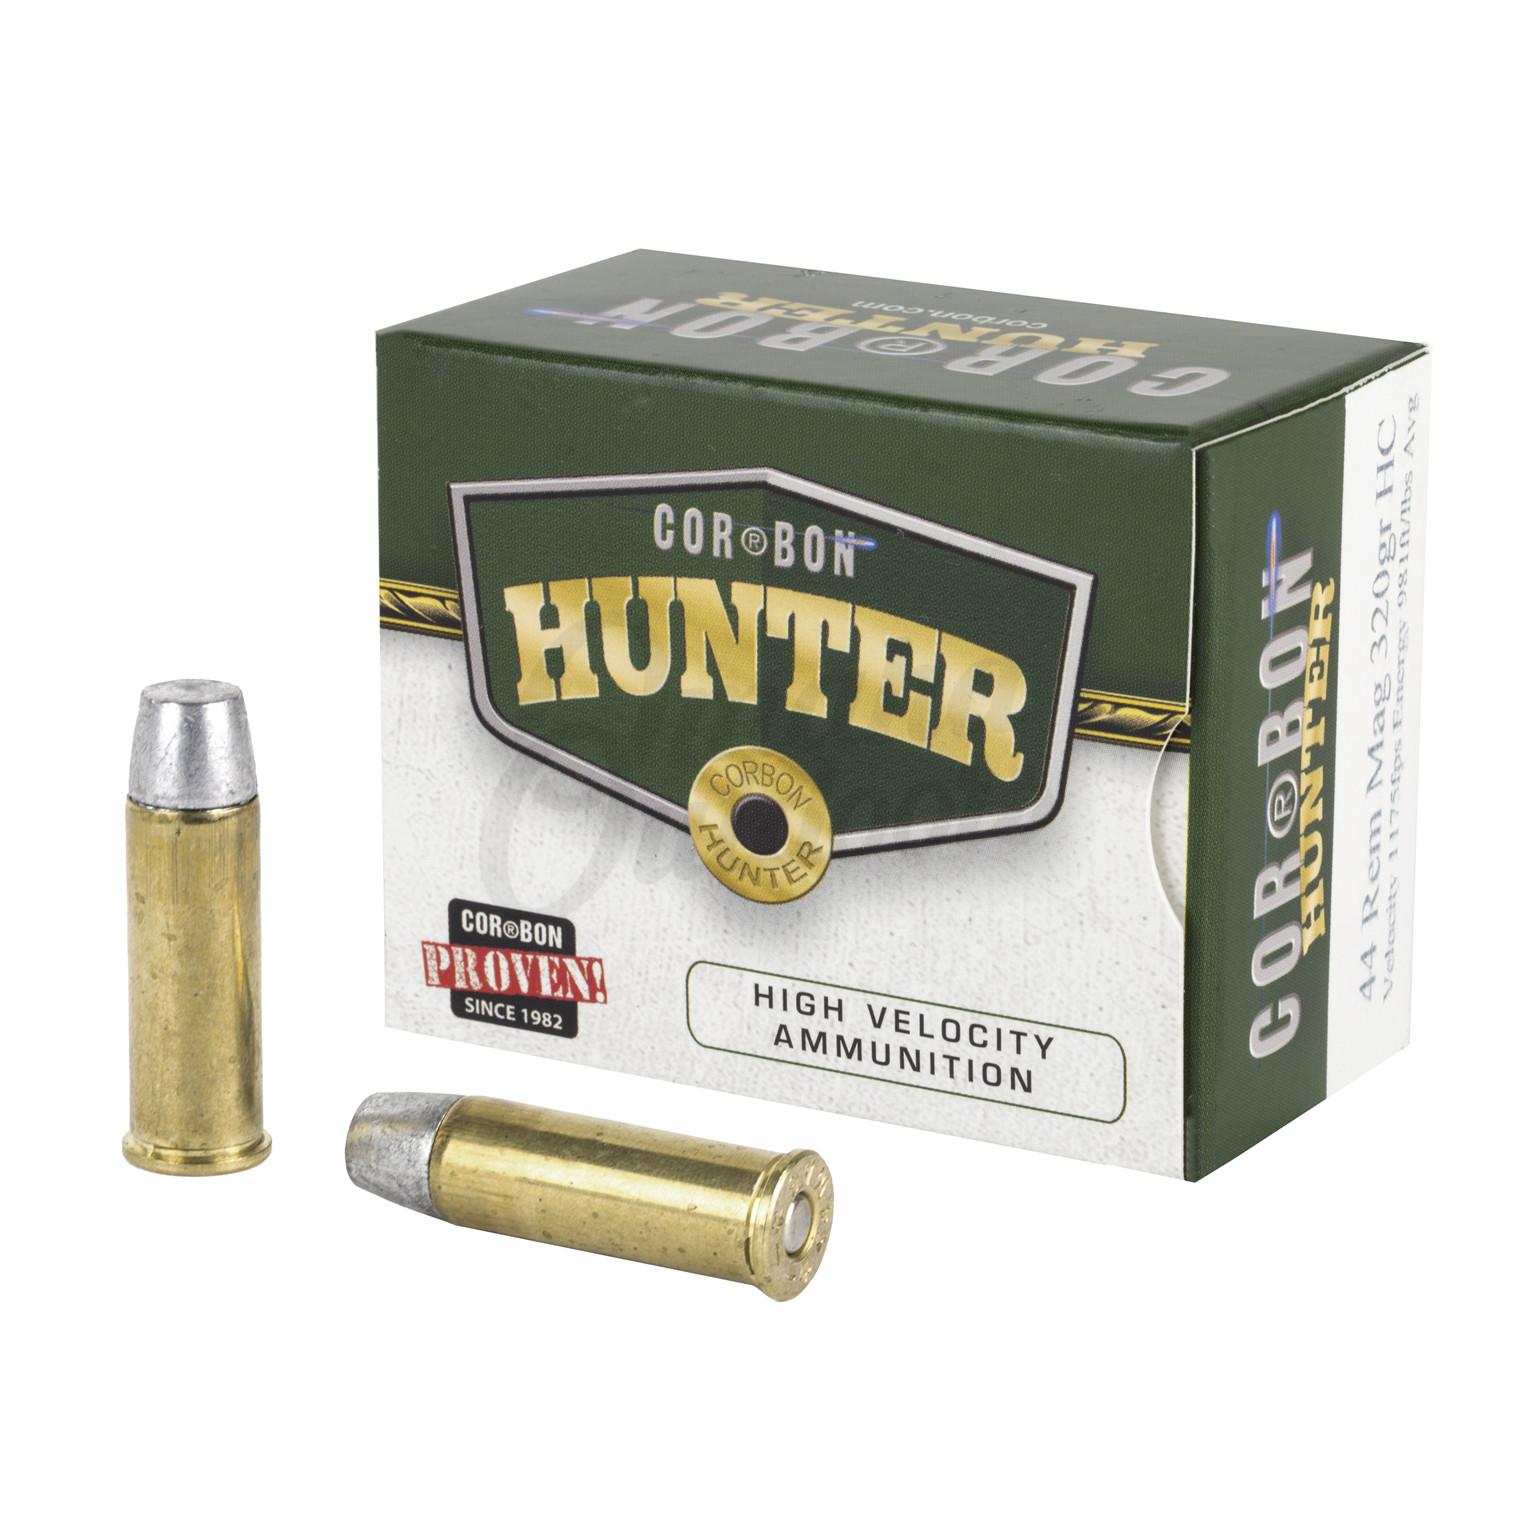 CorBon Hunter Ammo 44 Magnum 320 Grain Hard Cast 20 Round Ammo Box